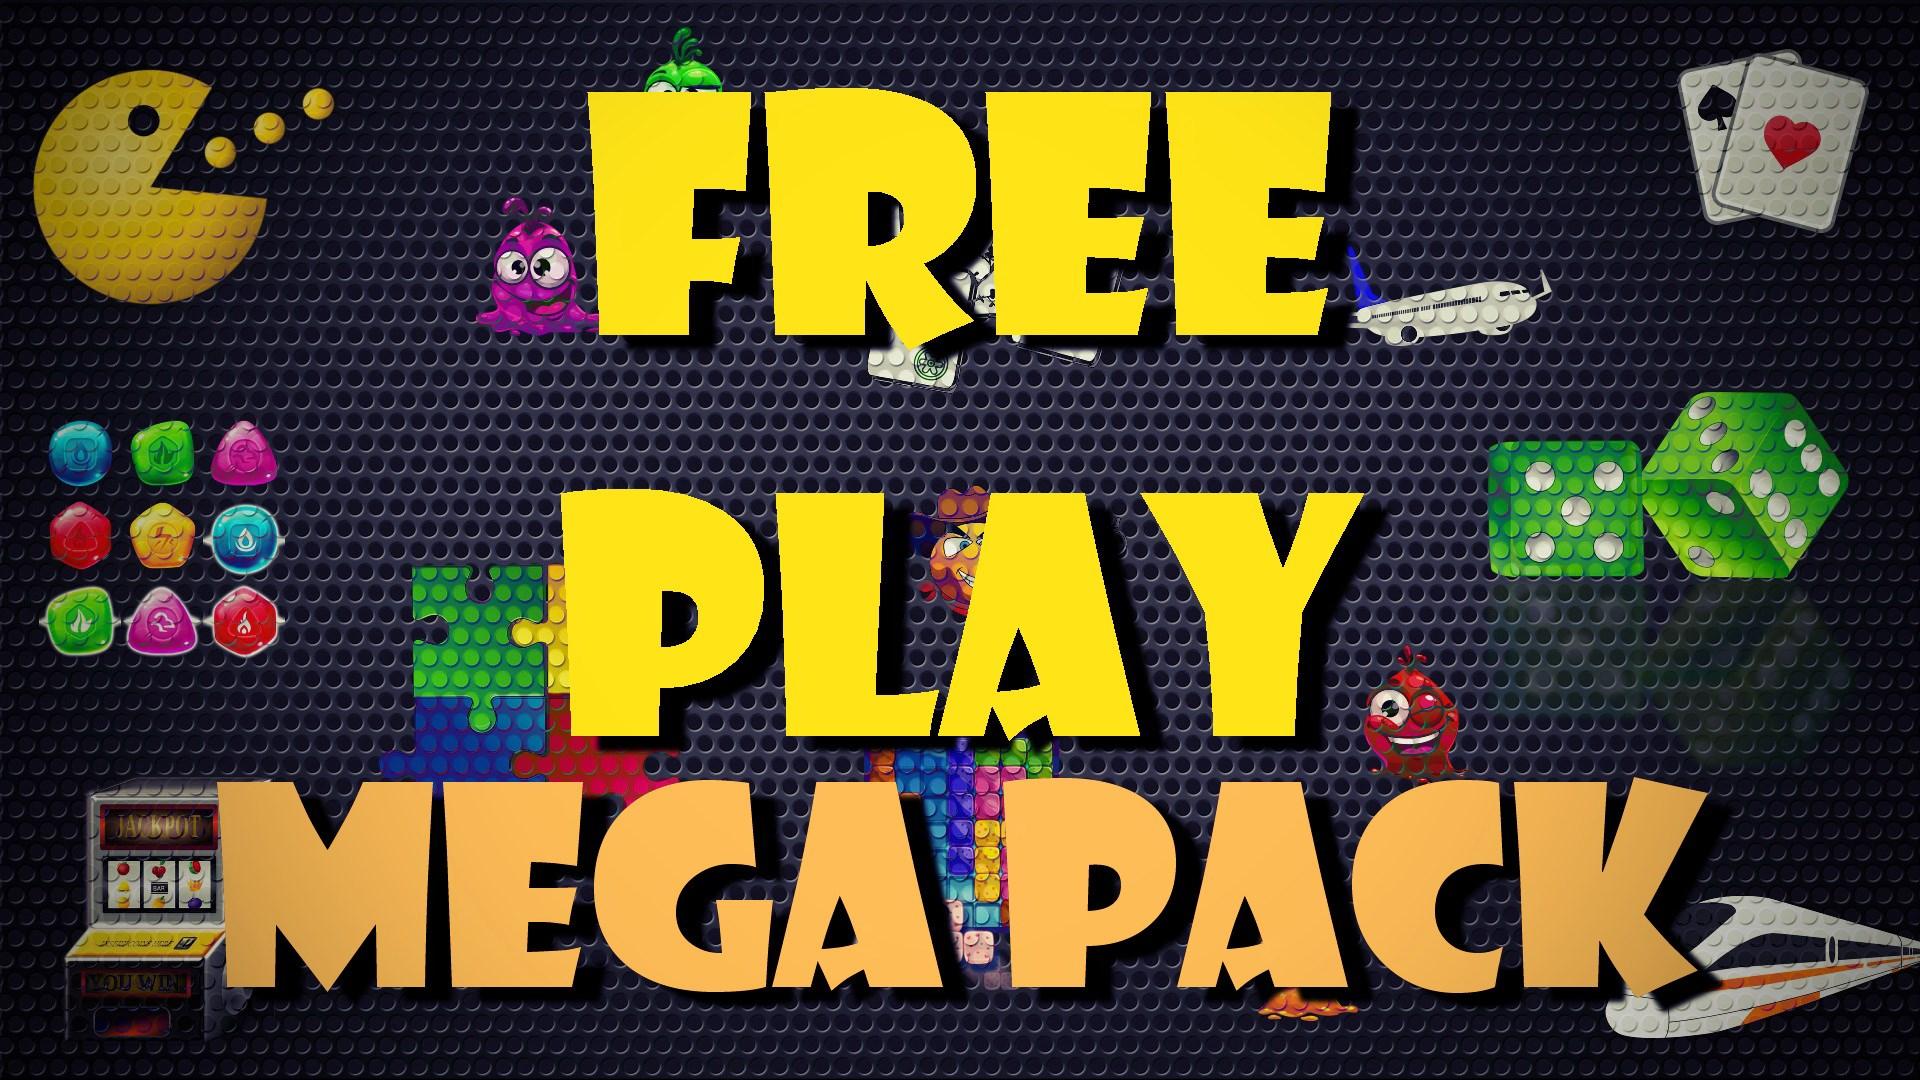 Get Free Play Mega Pack - Microsoft Store